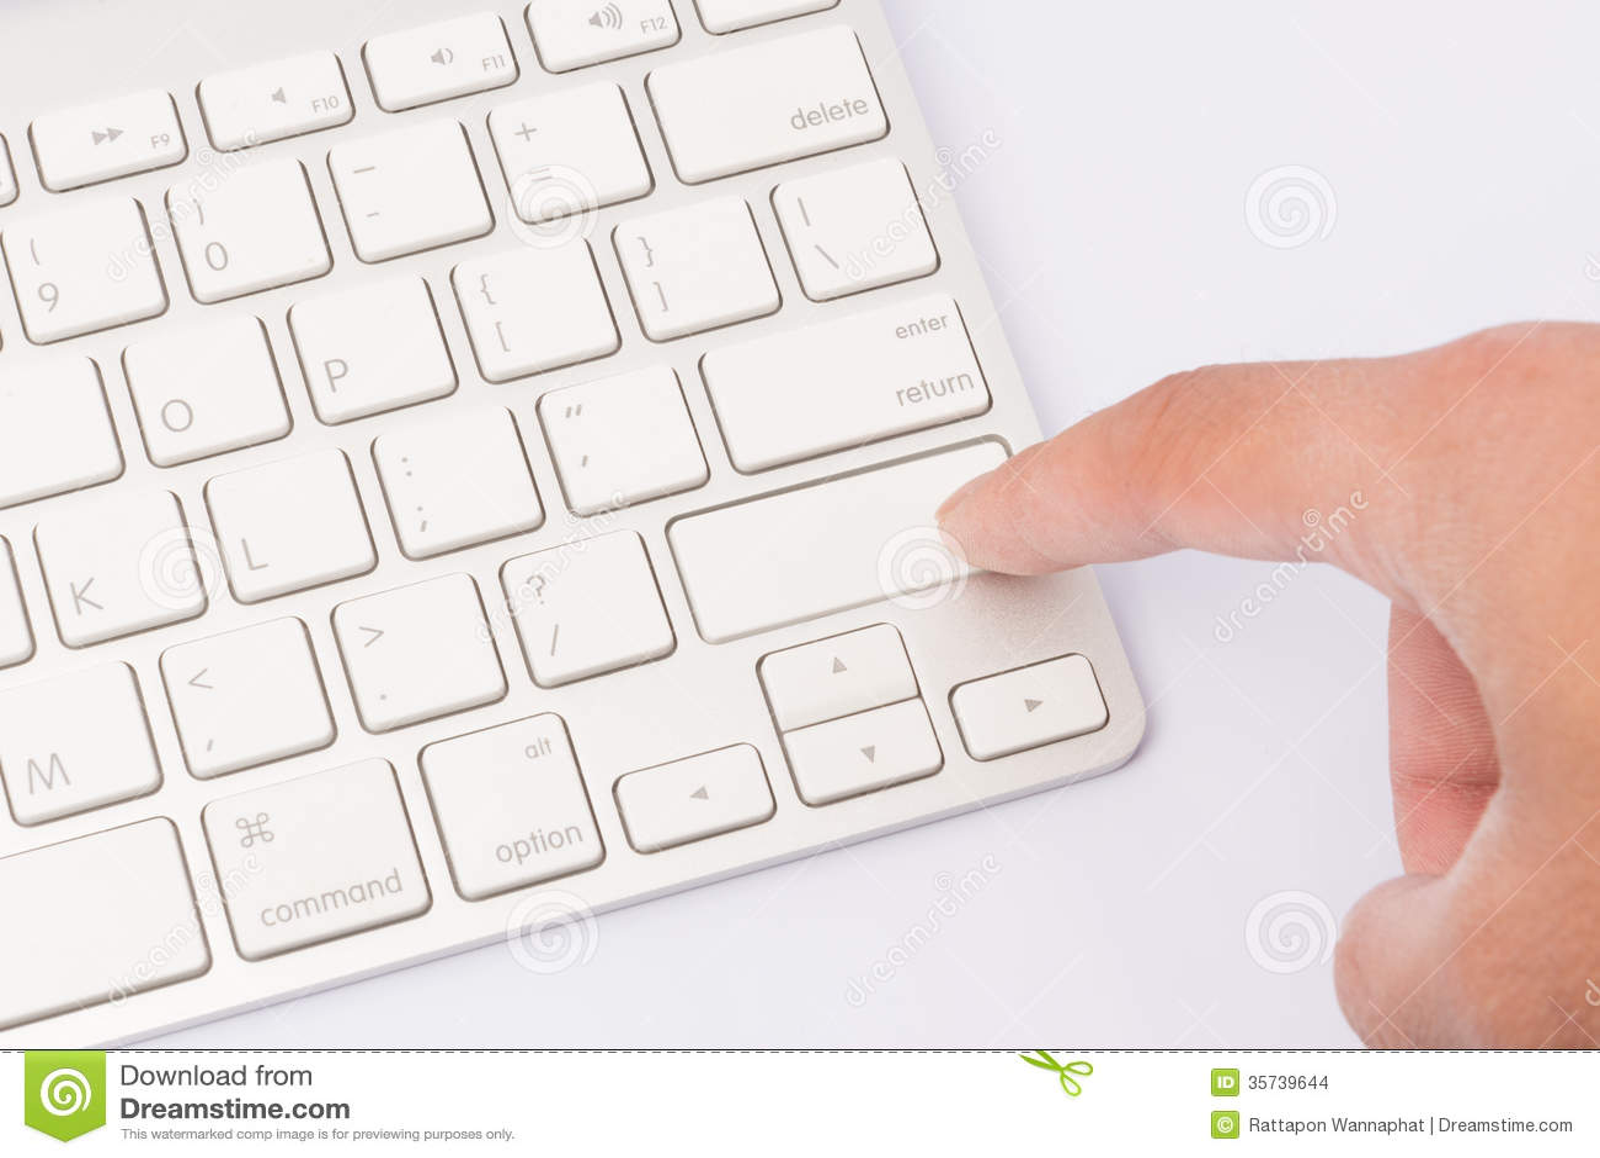 Press Keyboard Blank Finger Stock Images